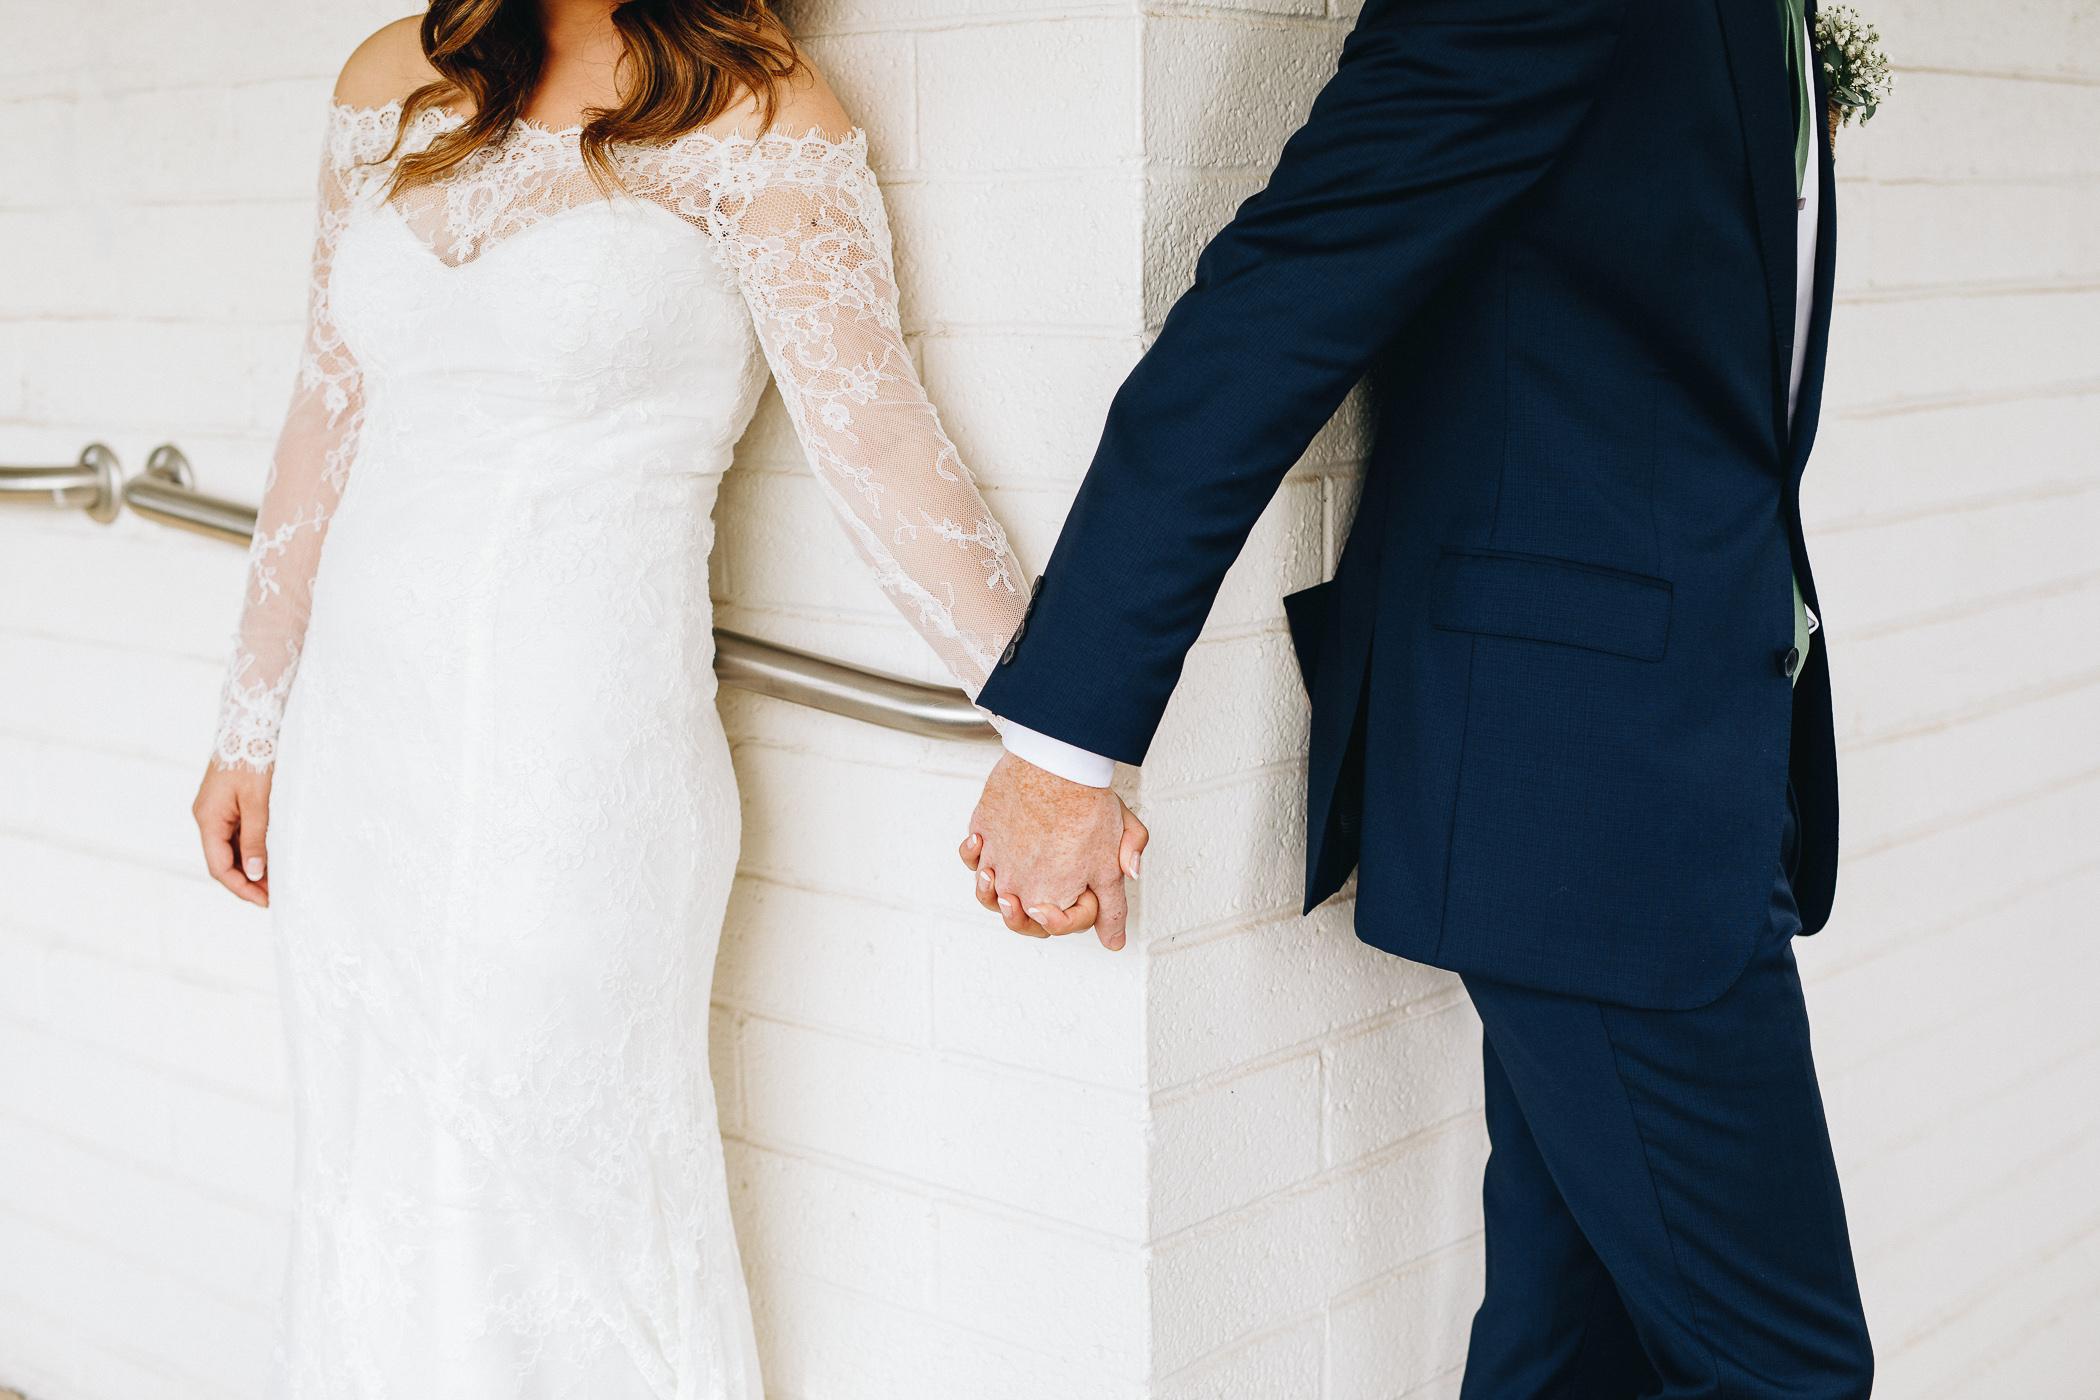 181104-Luxium-Weddings-Arizona-@matt__Le-Brandon-Kariana-Phoenix-Valley-Garden-Center-1044.jpg